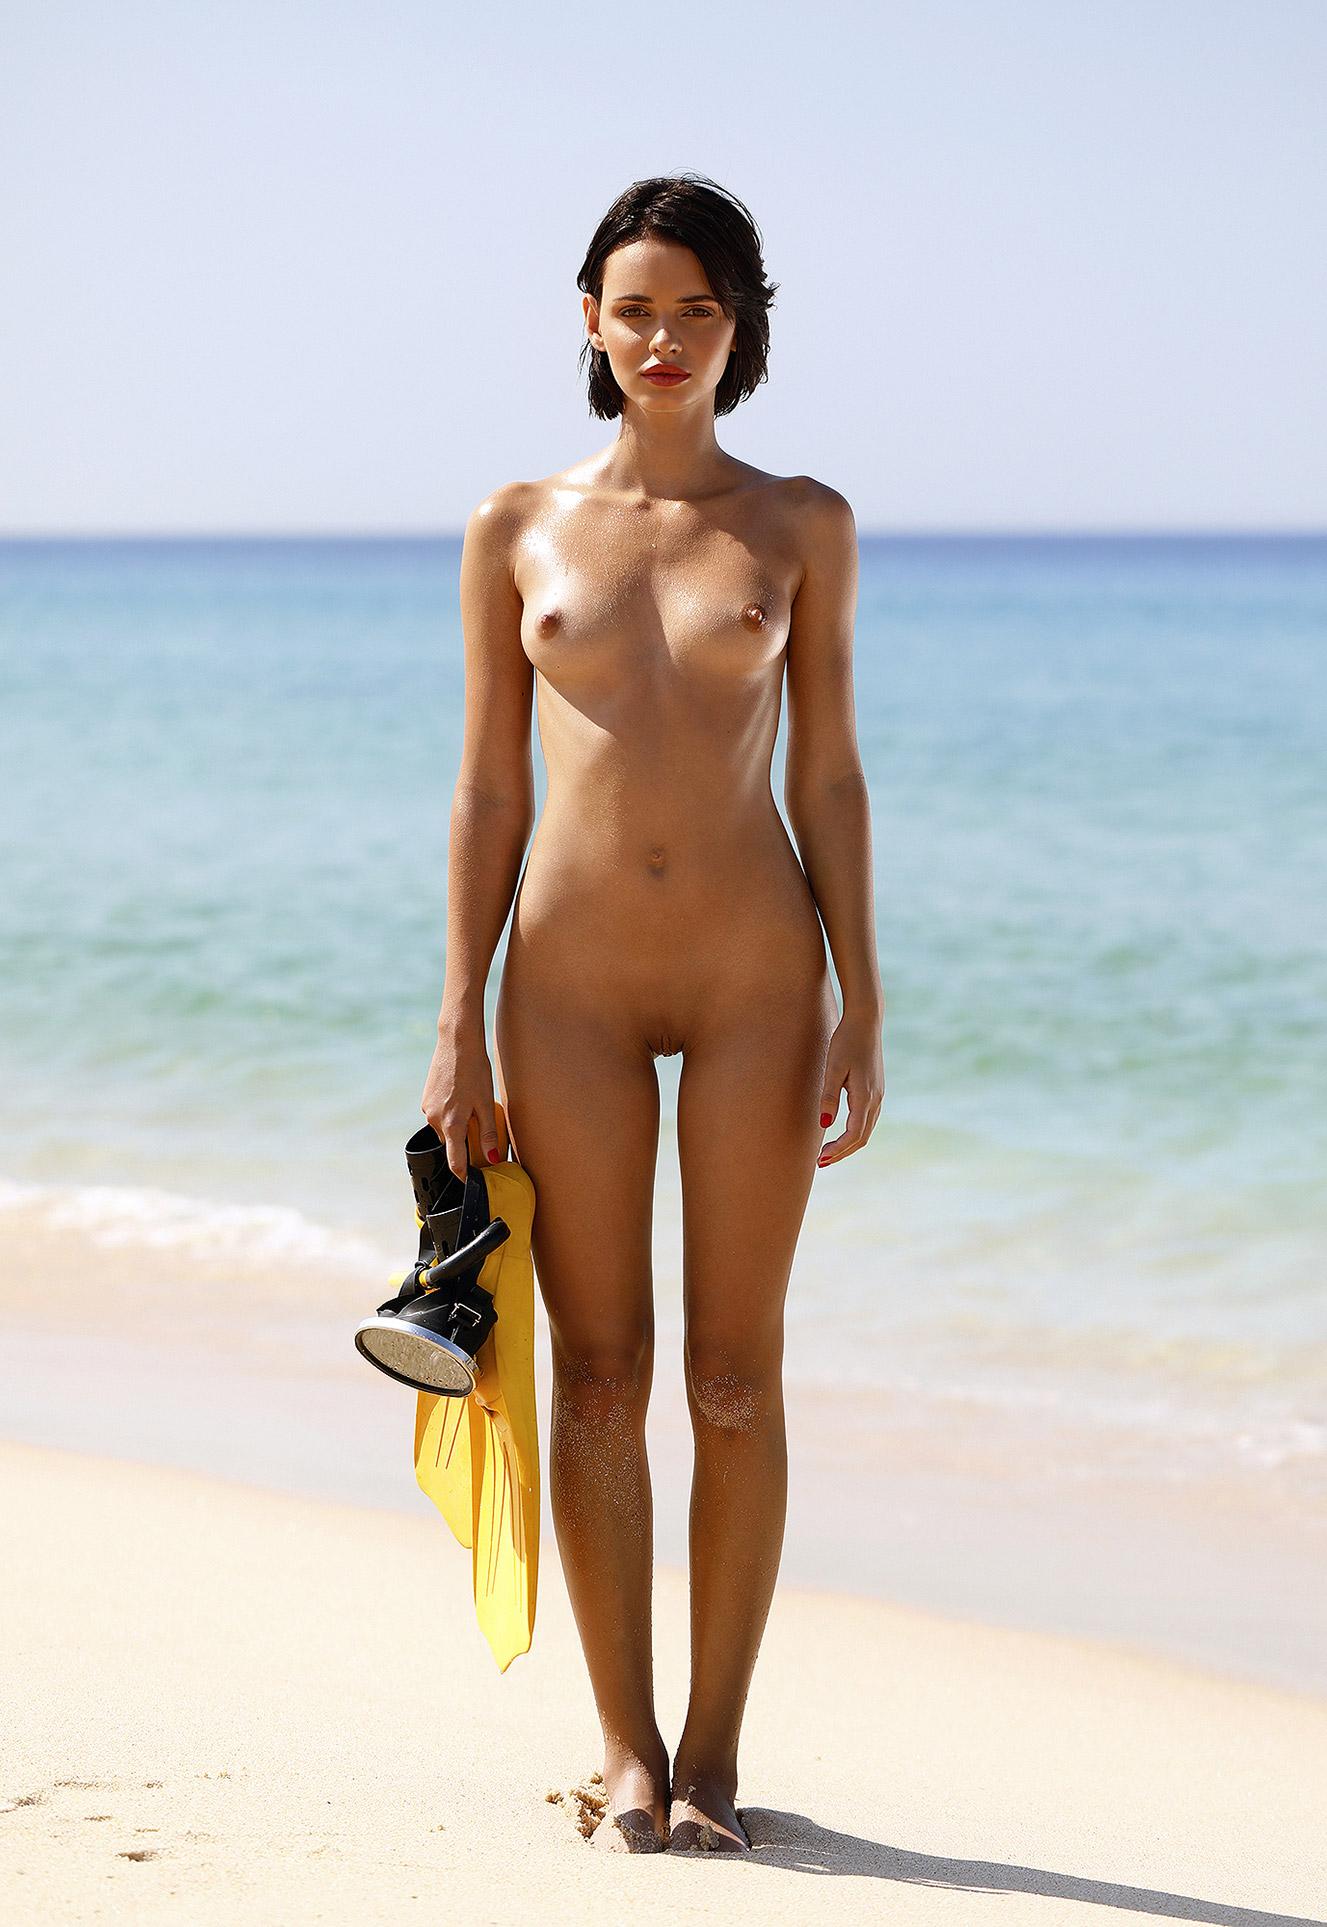 Наталья Удовенко / Natalia Udovenko naked by Ana Dias